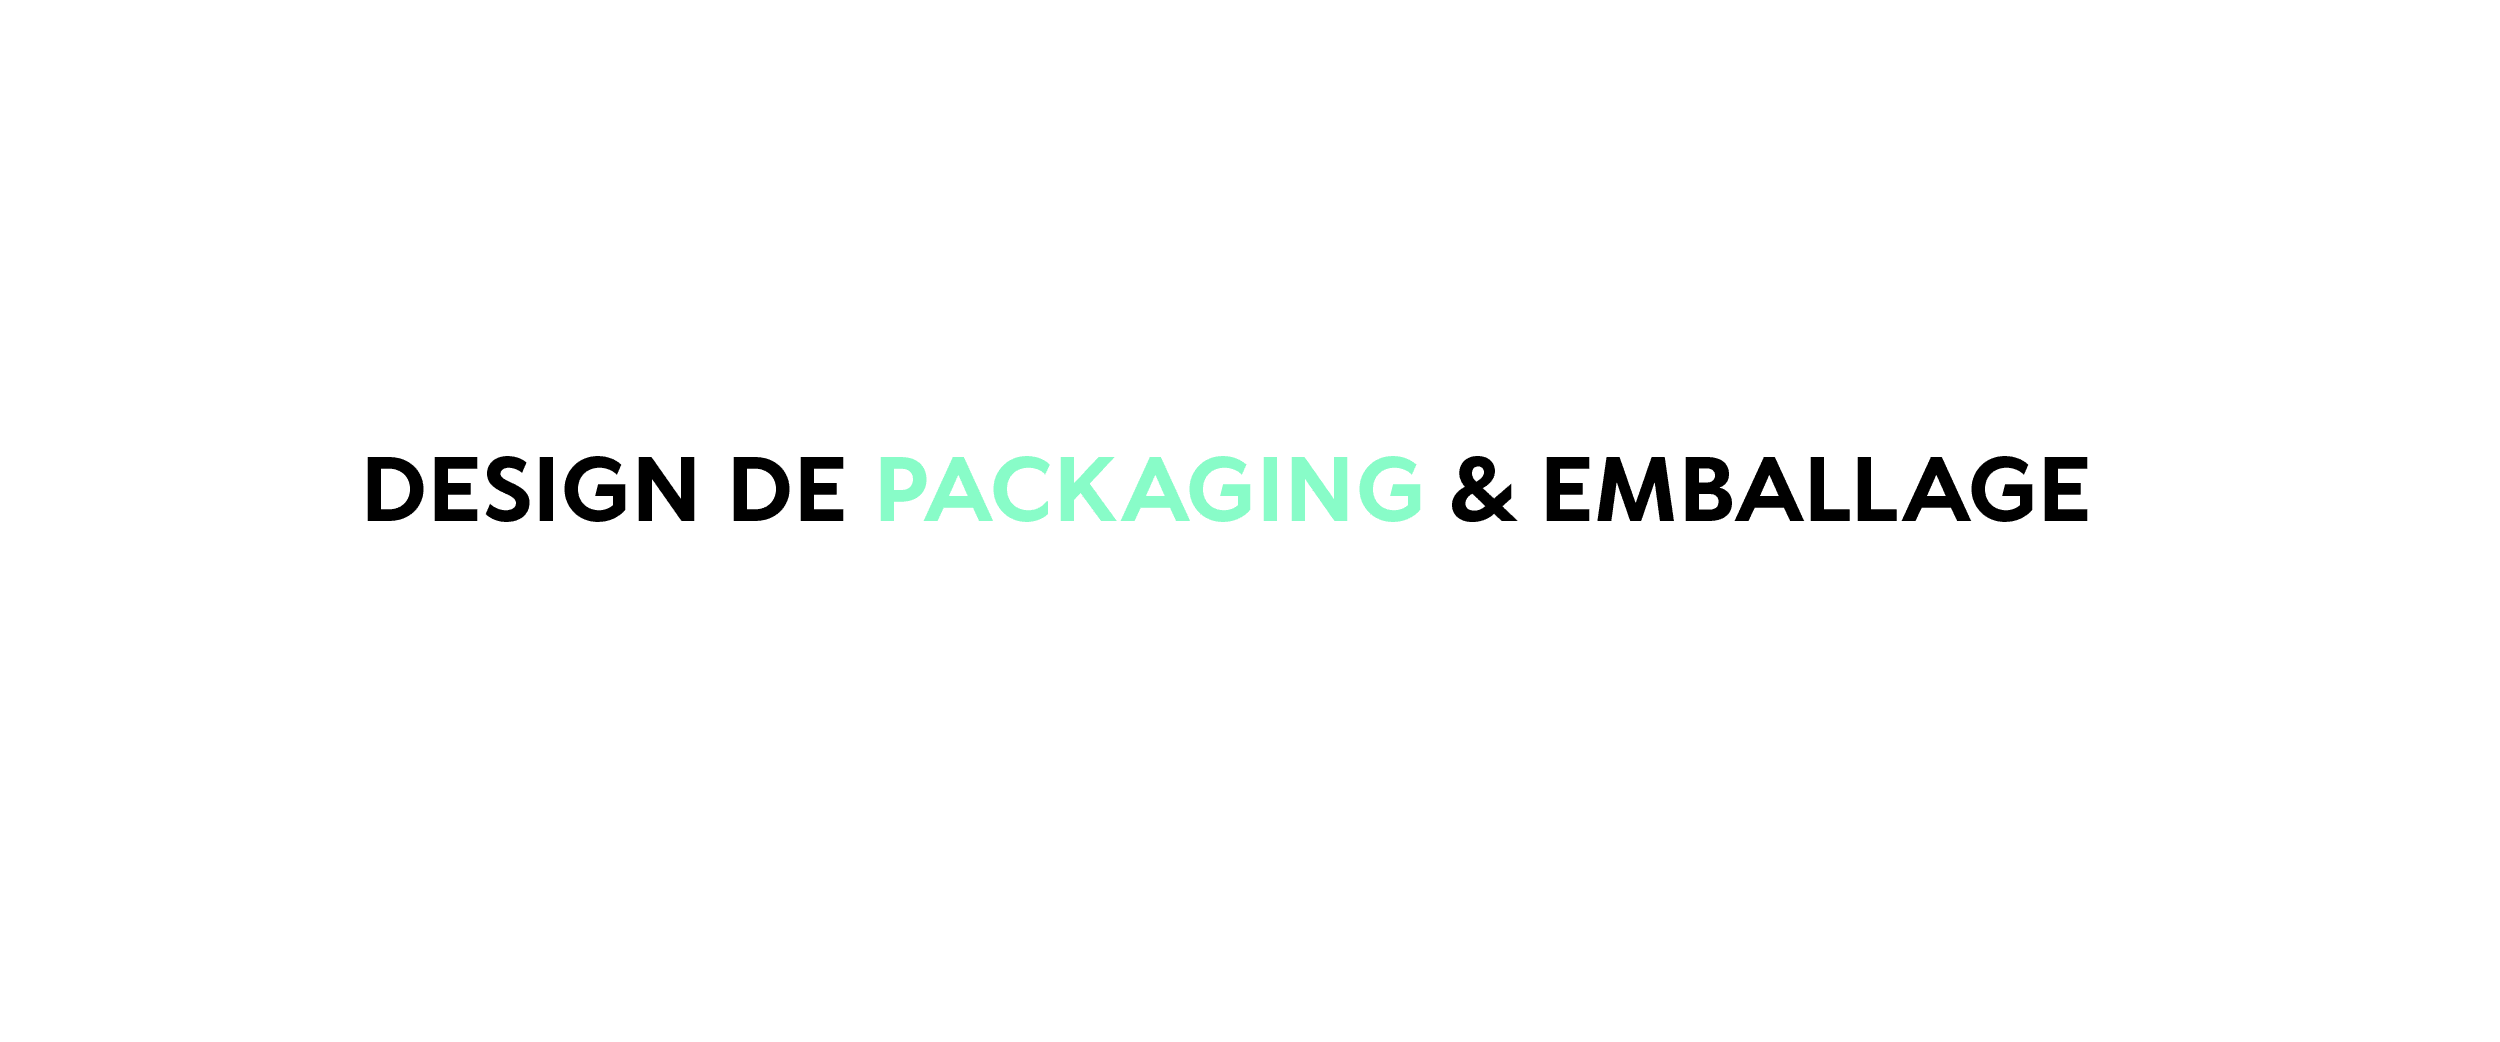 bannière-pontarlier-agence-de-communication-graphiste-graphisme-logo-packaging-emballage